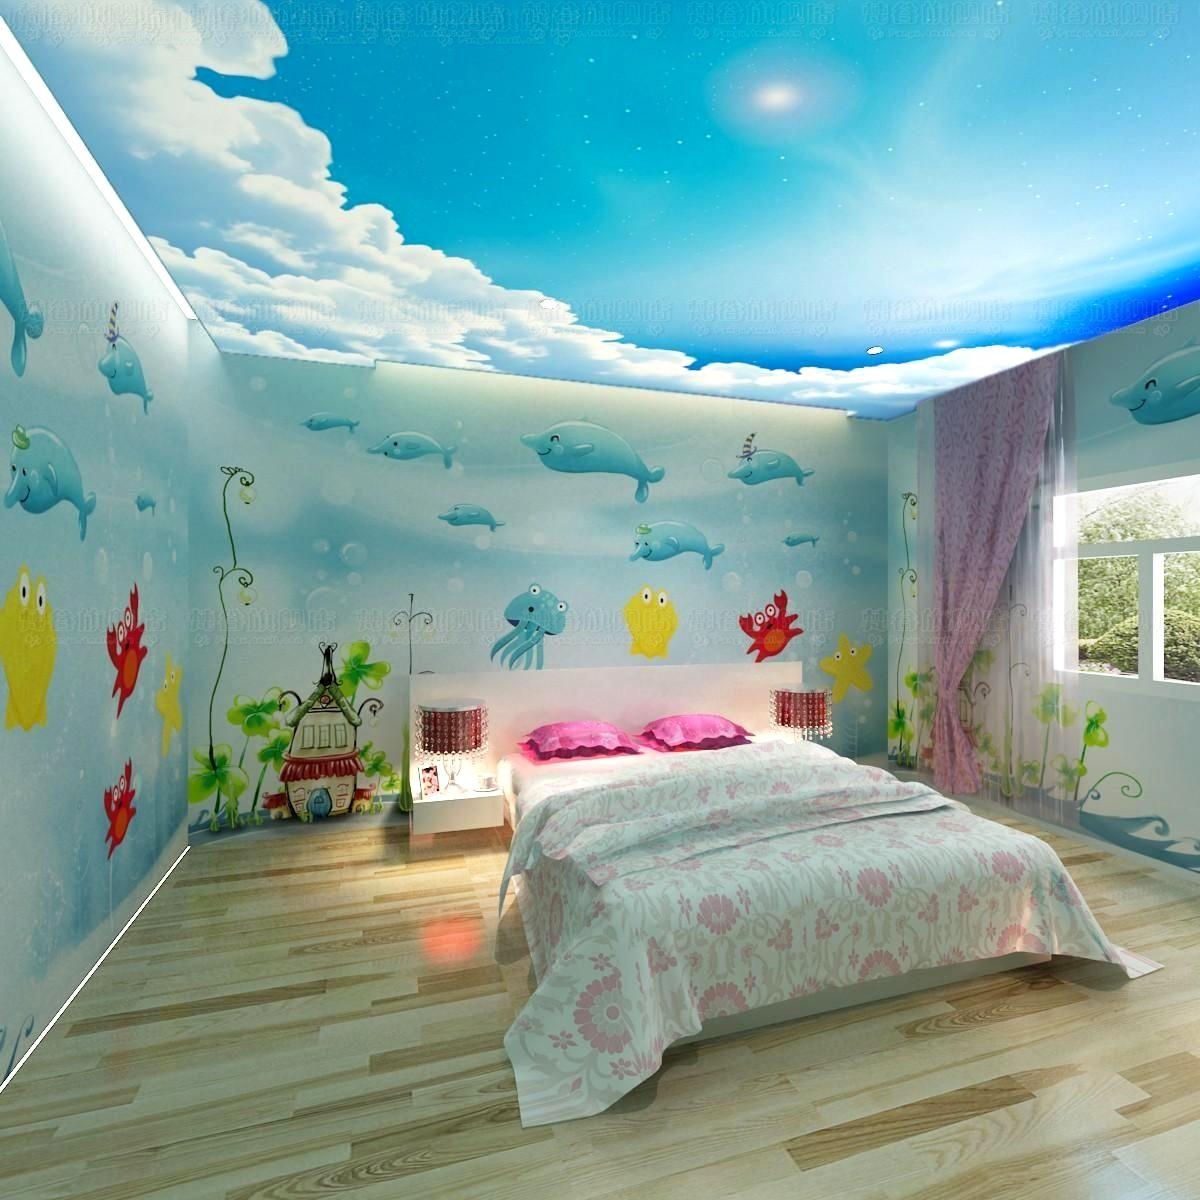 30 Beautiful Kids Bedroom Wallpaper In 2020 Kids Bedroom Wallpaper Themed Kids Room Kids Room Wallpaper